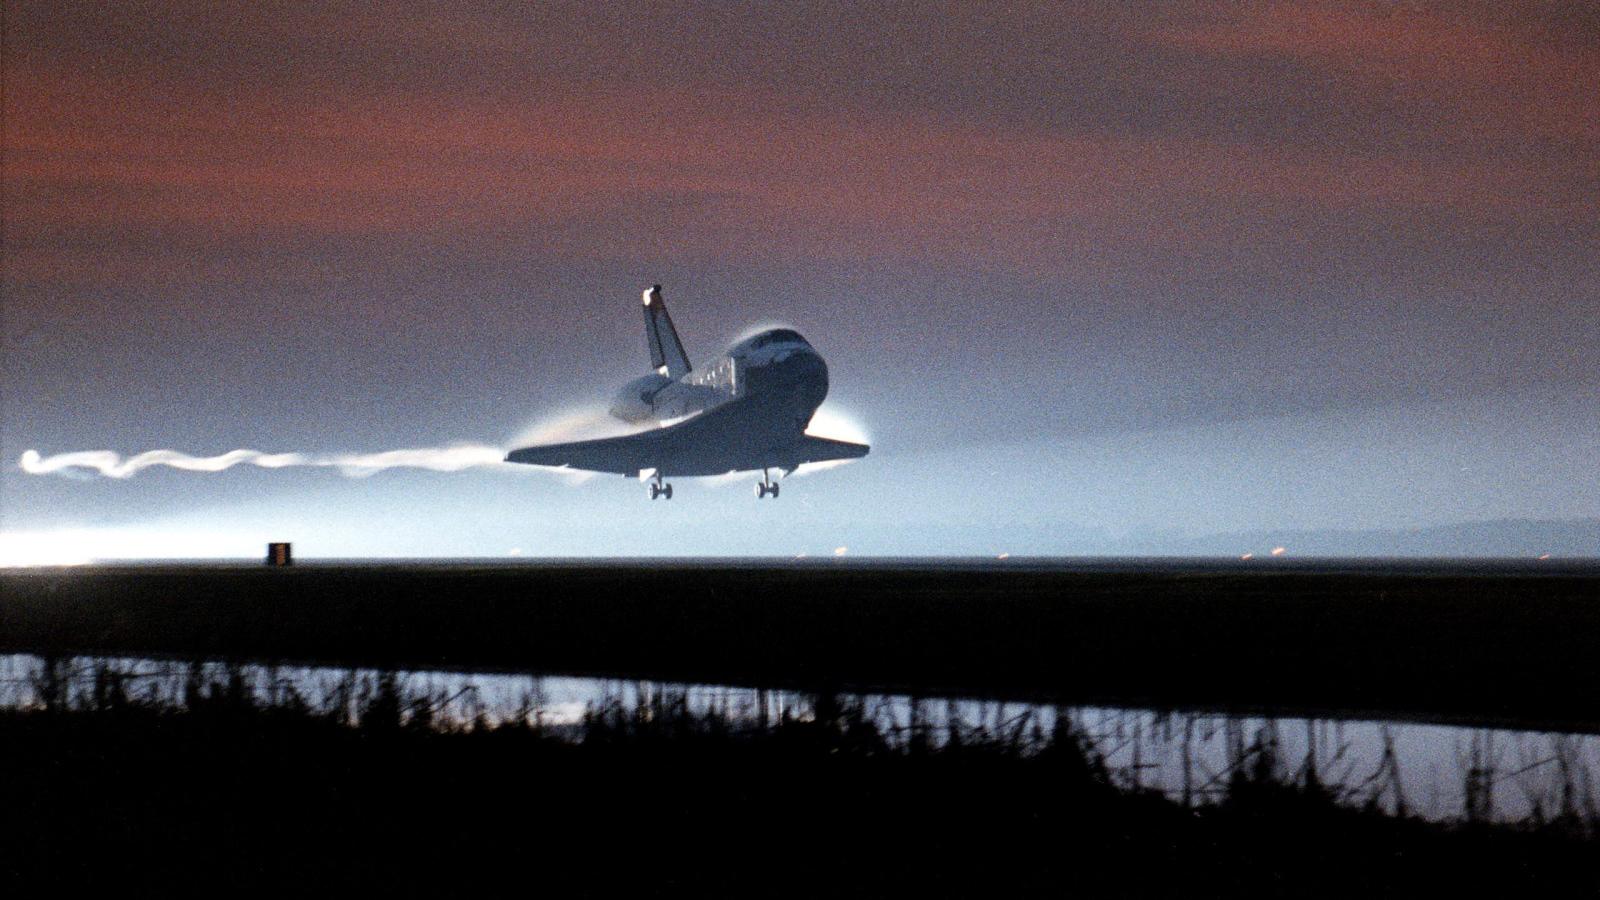 Space shuttle desktop wallpaper wallpapersafari - Space wallpaper 1600x900 ...